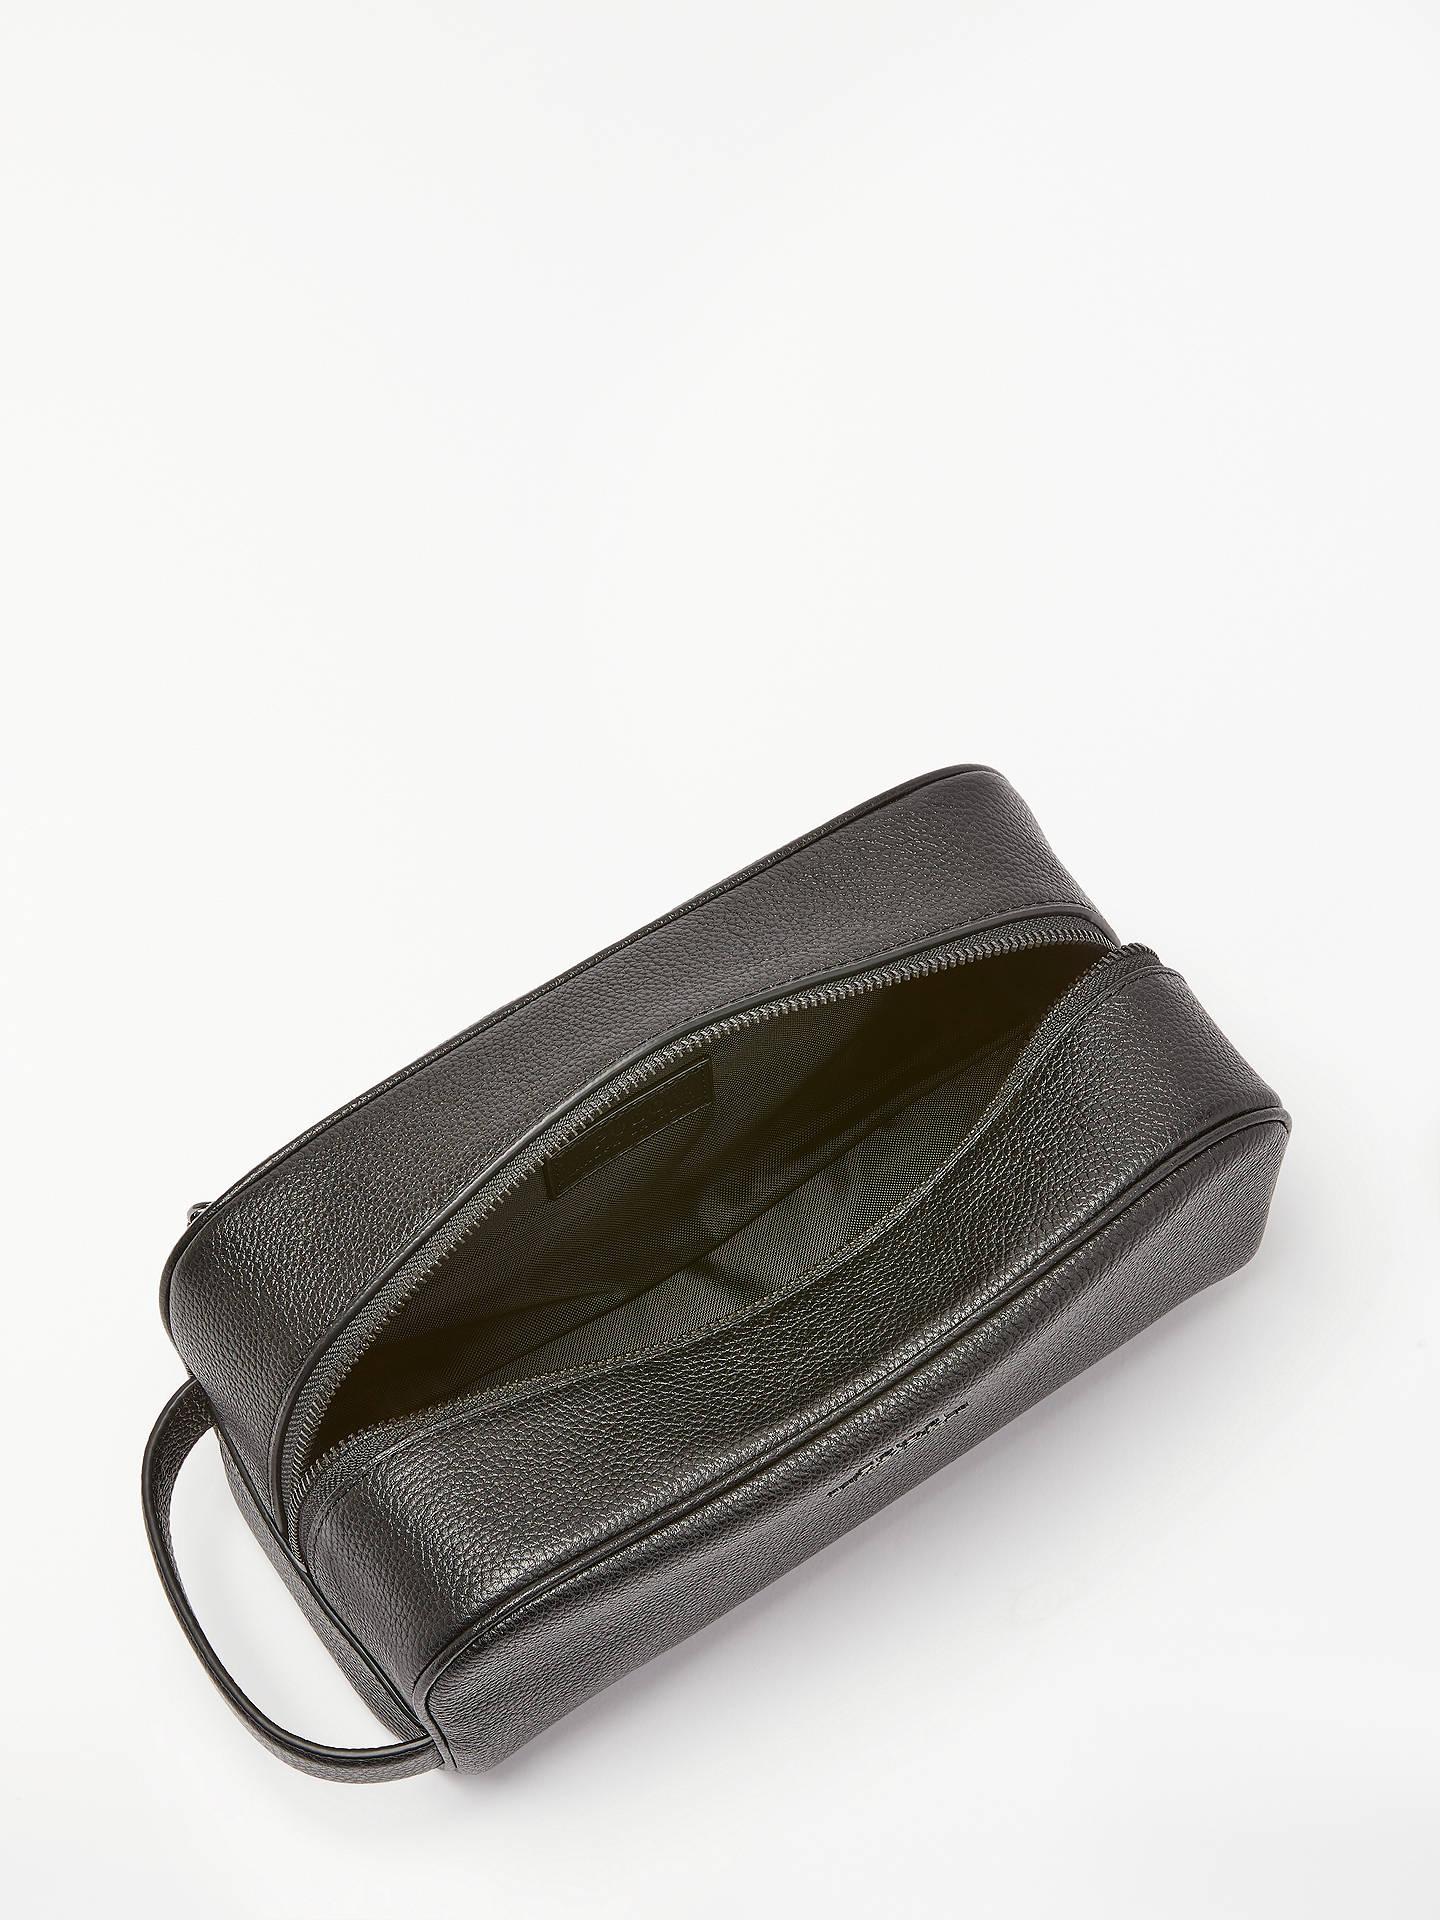 ... BuyPolo Ralph Lauren Pebble Leather Wash Bag, Black Online at  johnlewis.com ... 6b8115f9a6